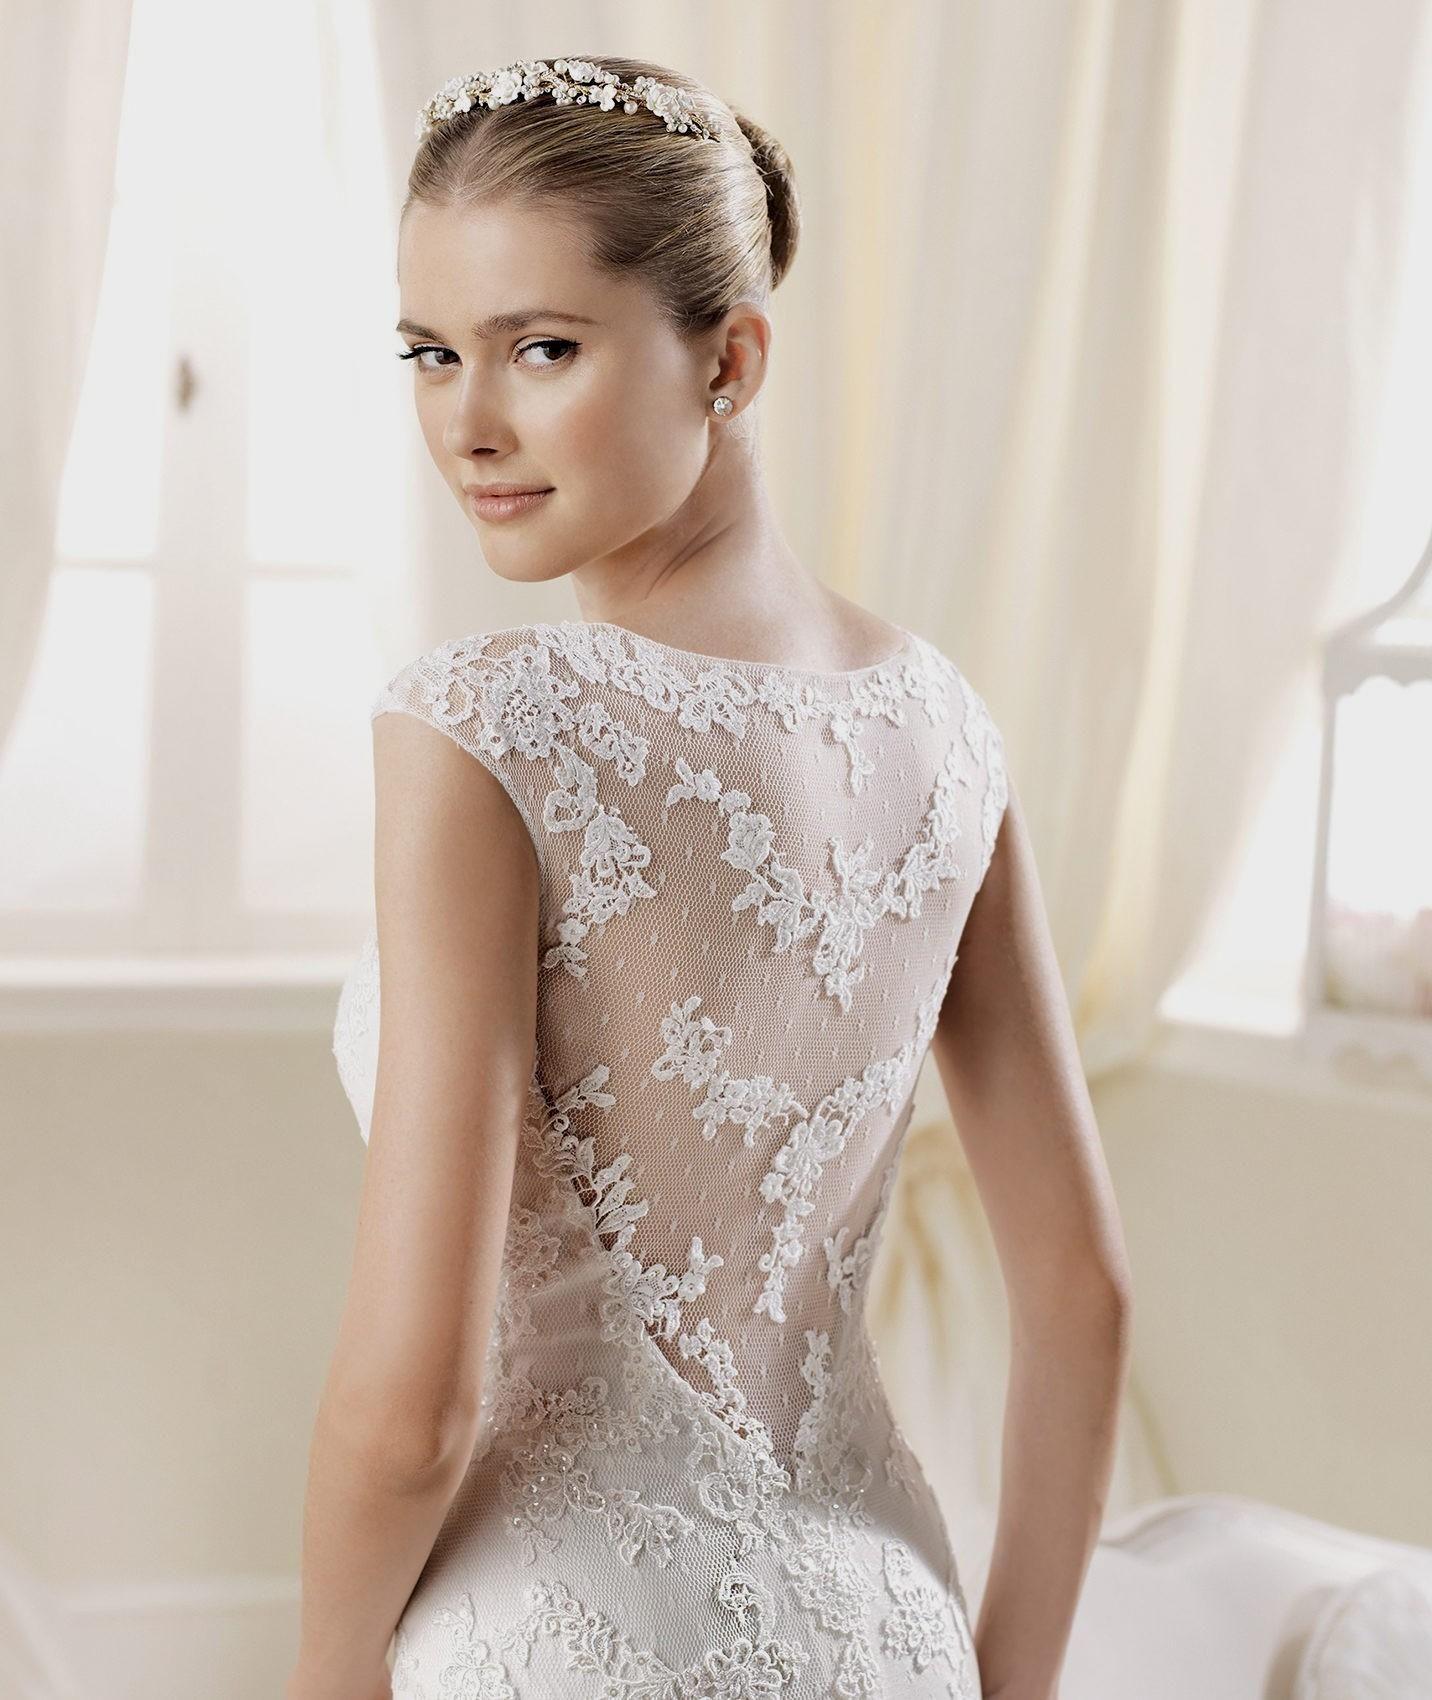 Image result for lace top wedding dresses wedding pinterest